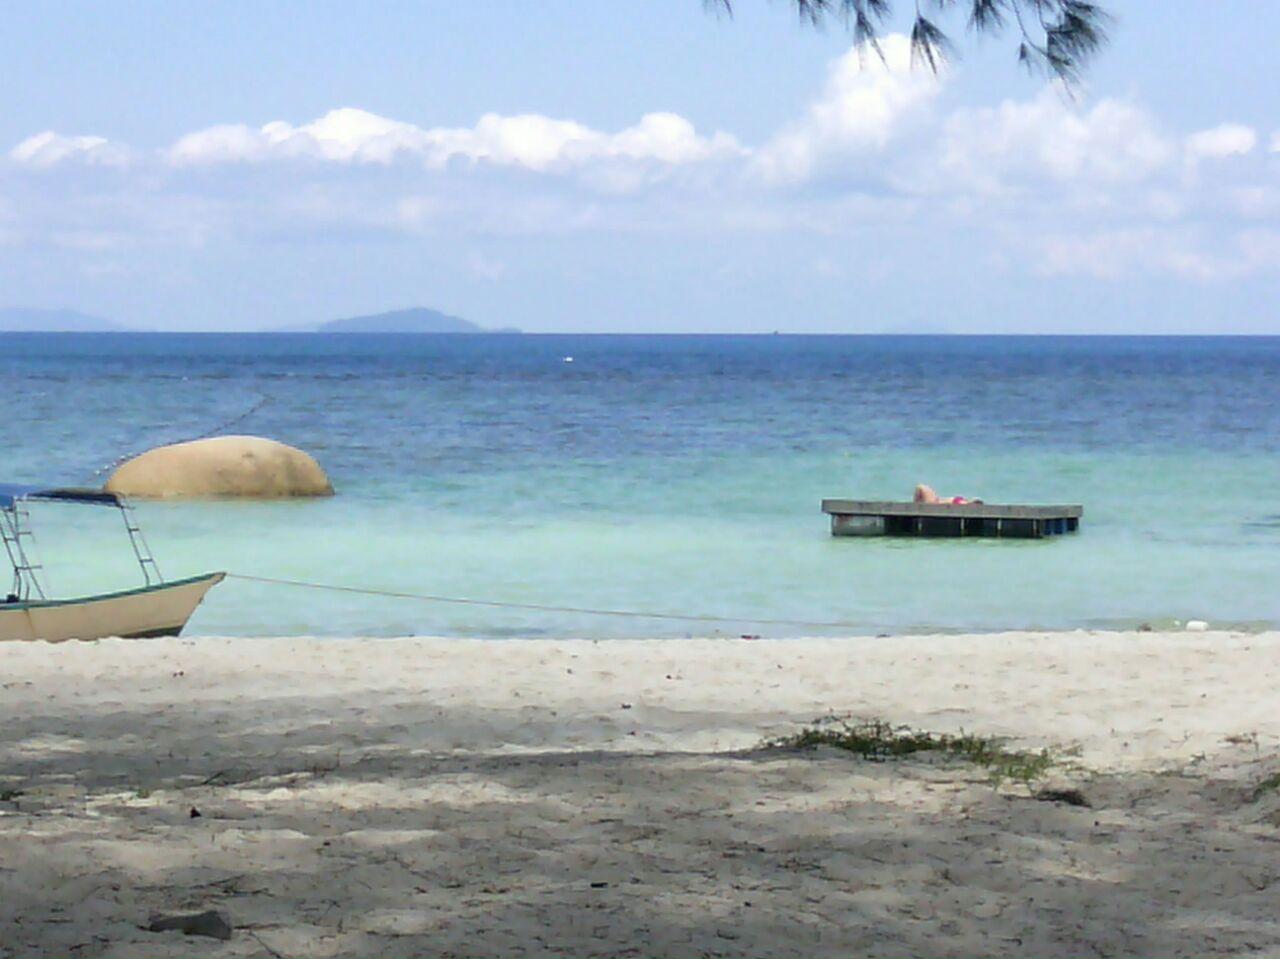 Sunbath on pontoon. #WatercoloursResort #Pulau #Perhentian #Beautiful #Beach #Island #Resort #Travel #Vacation #Tours #Professional #Dive #Centre #Malaysia #Snorkeling #Corals #Fish #MarineLife #PADI #ScubaDive #DiveTrip #BoatDive #EcoConservation #Holiday #Family #TeamBuilding #Chalets #Impressedus #Hospitality #discovery